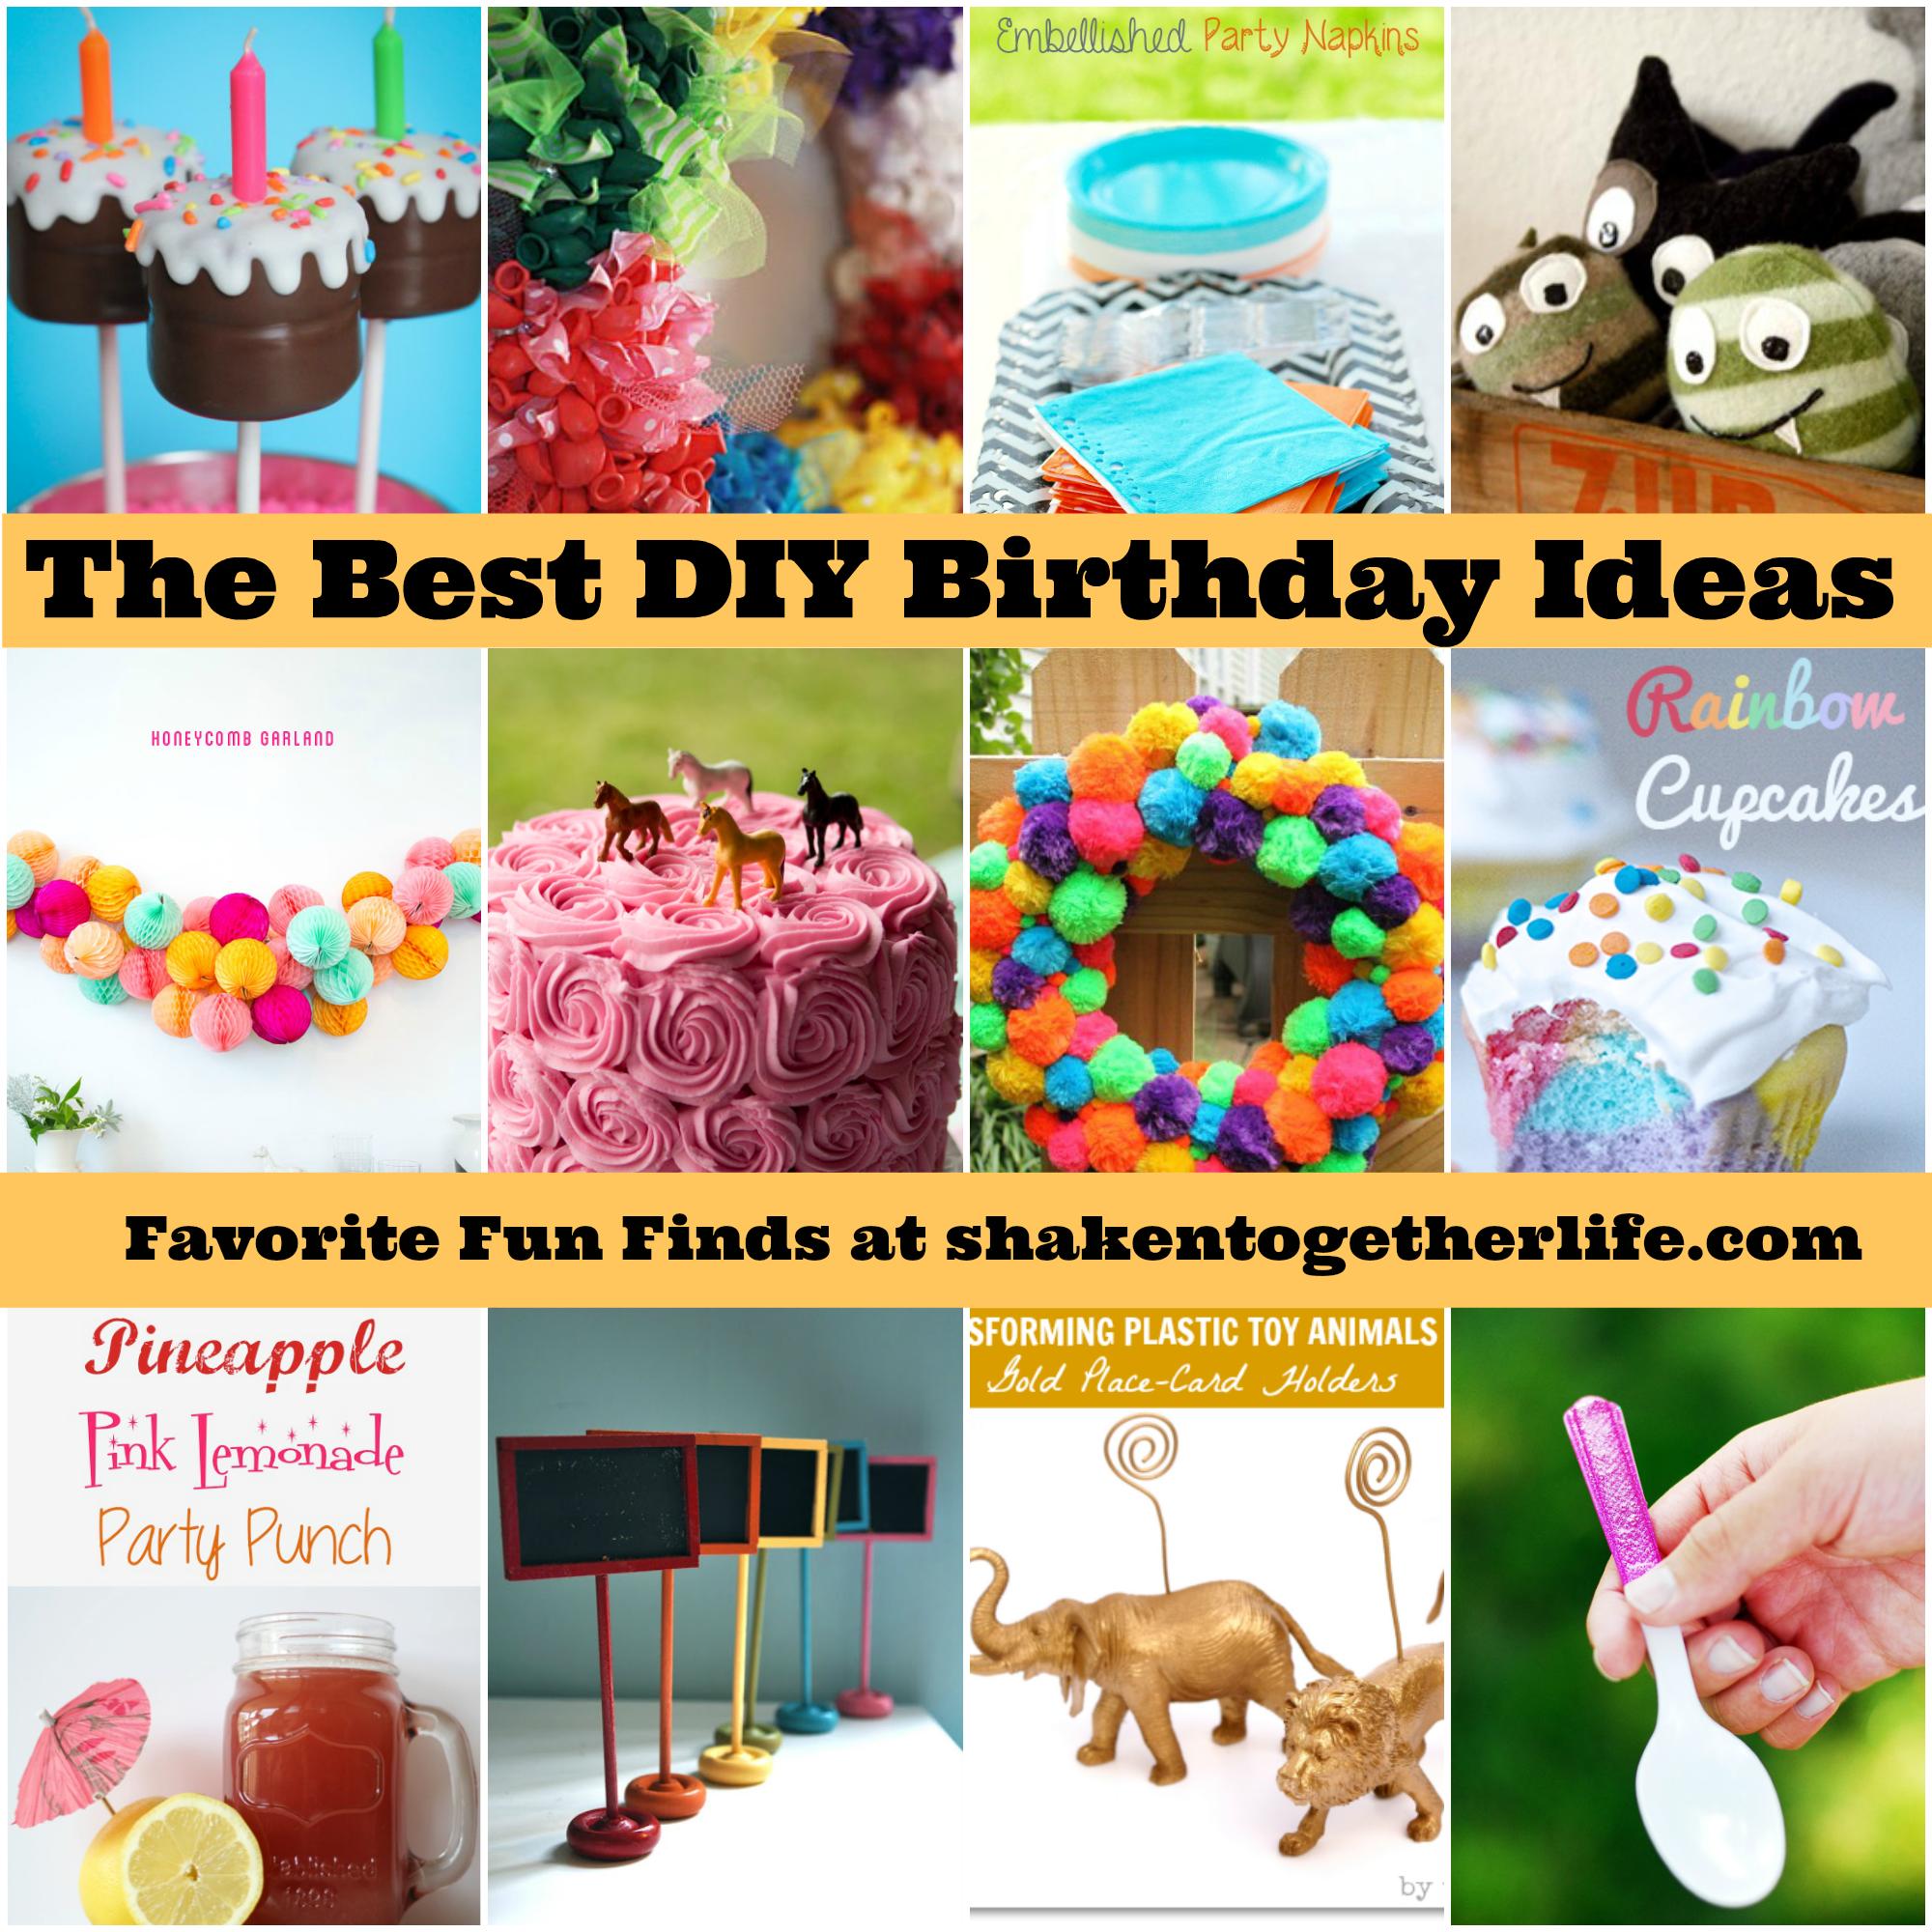 The Best DIY Birthday Ideas at shakentogetherlife.com